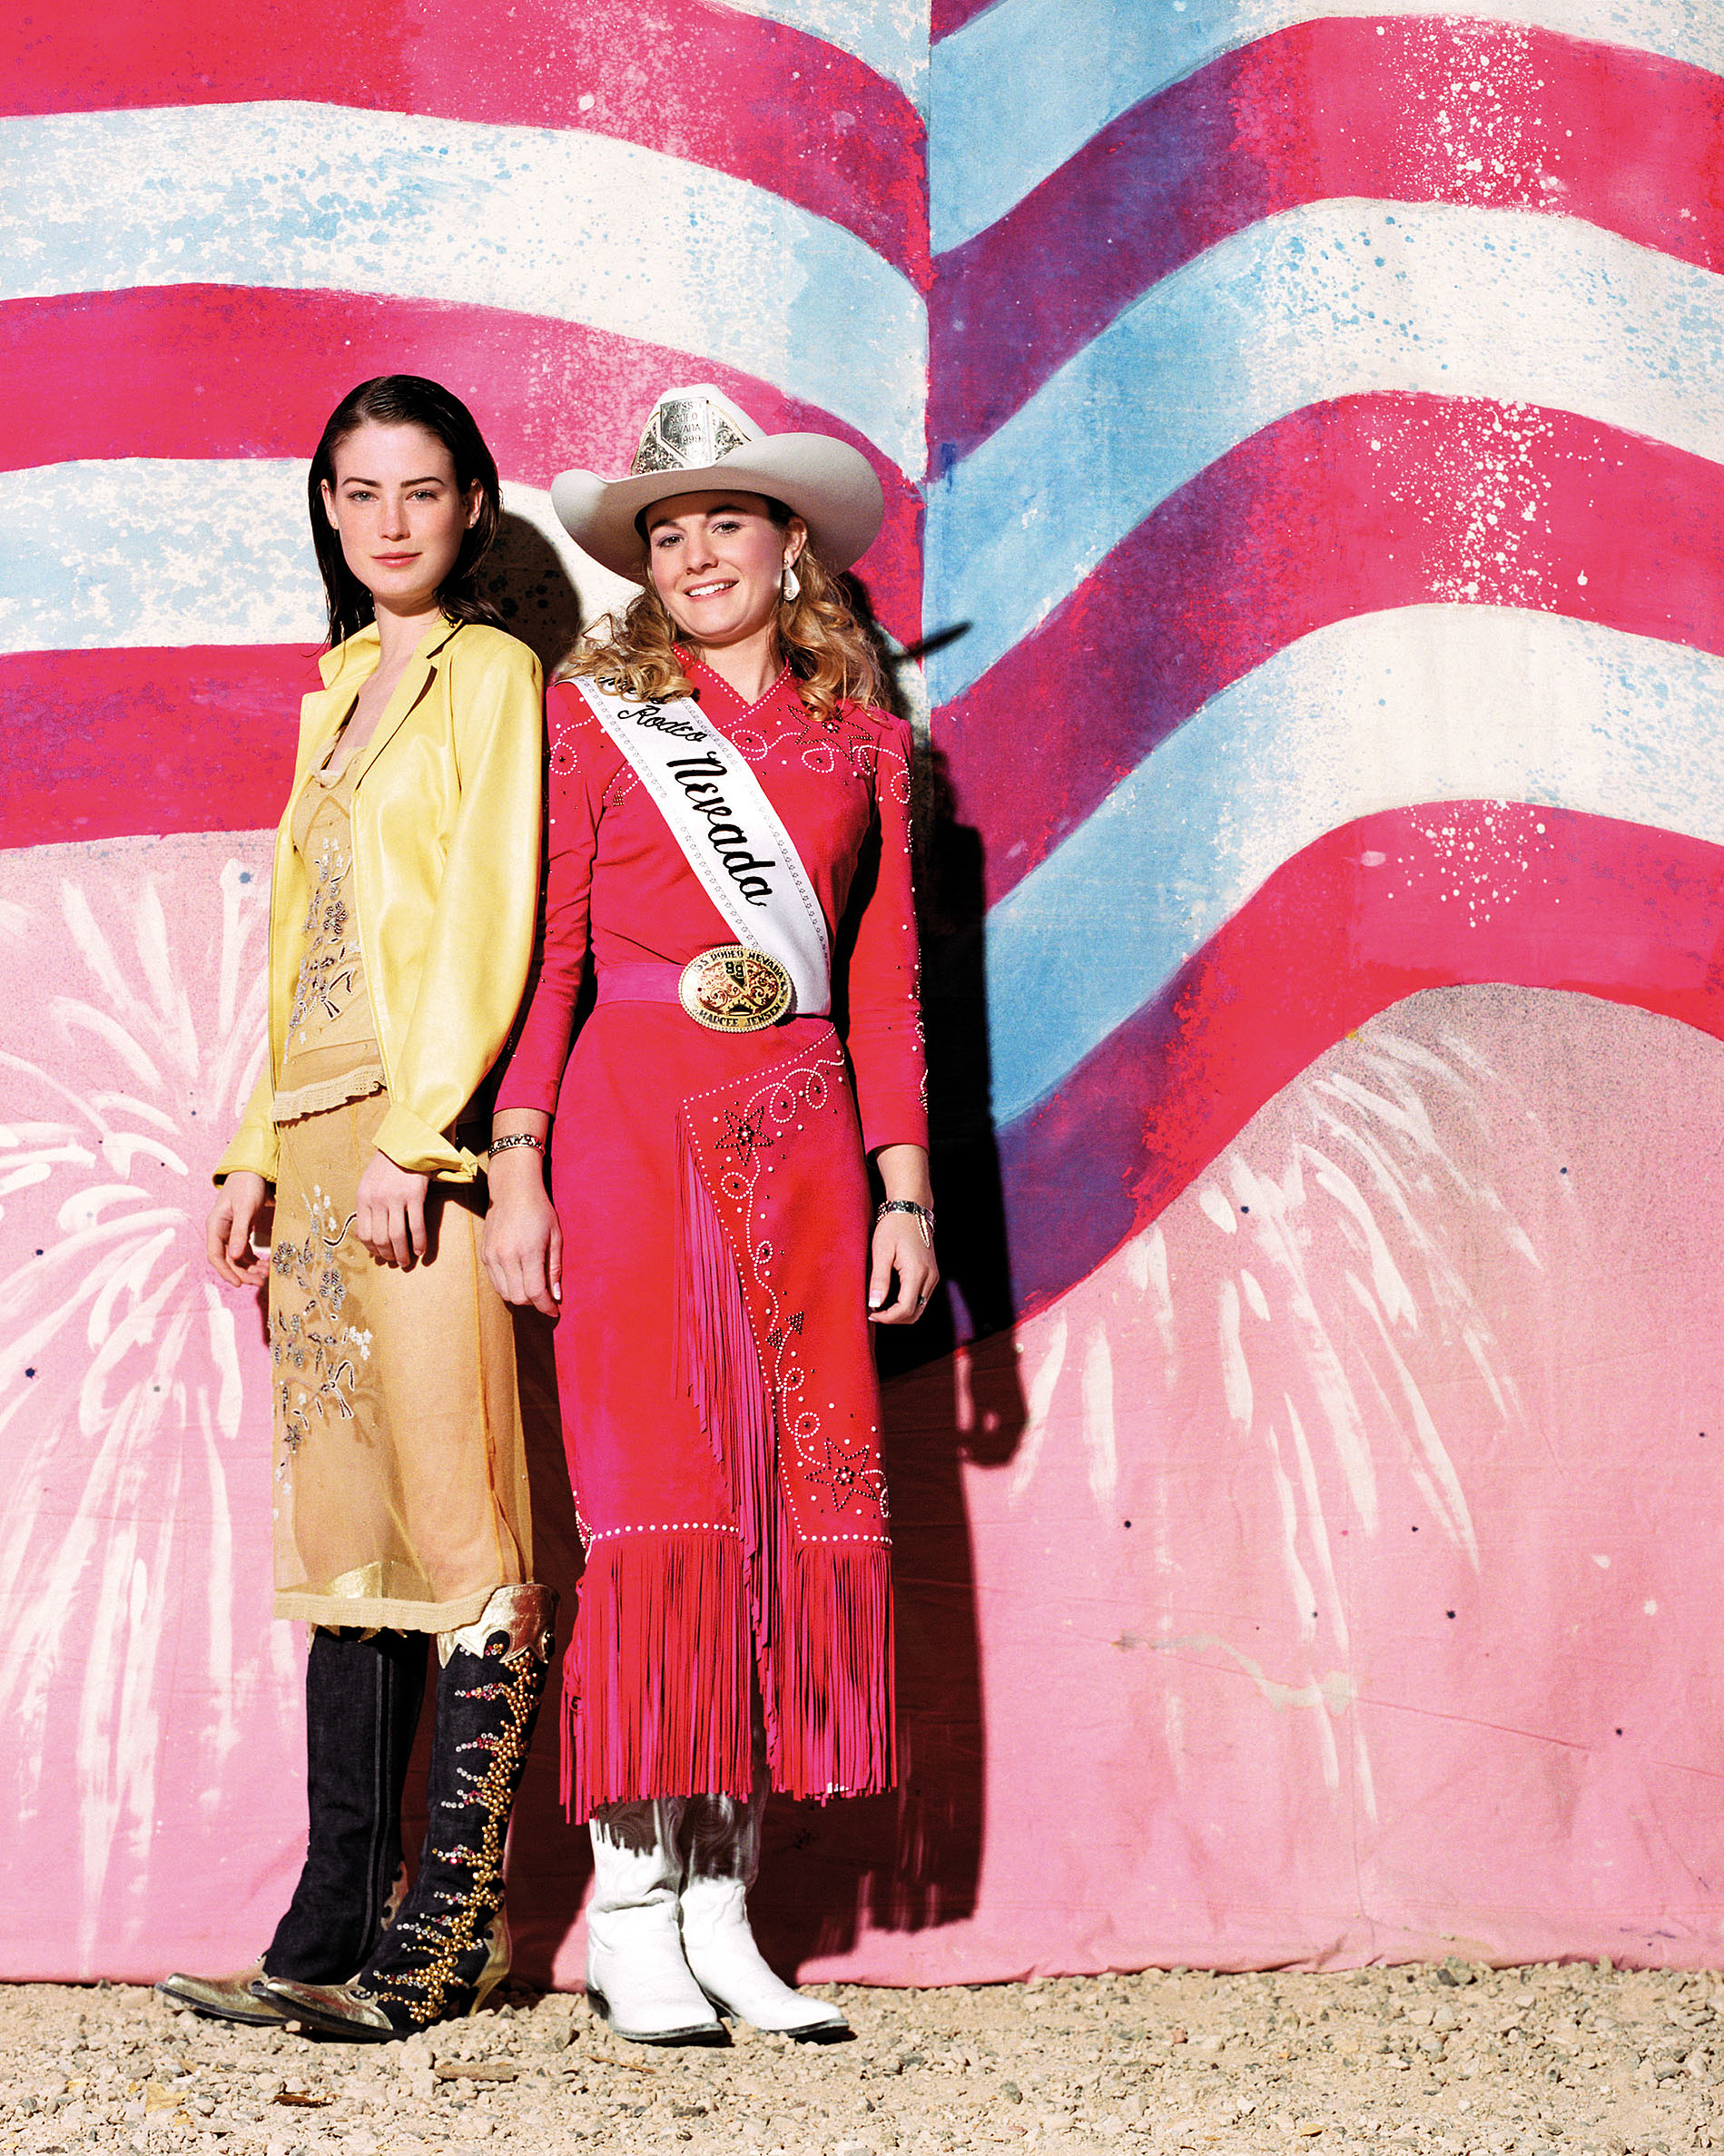 Hannes Schmid, Miss Nevada, a.d.S.: Las Vegas, 1999 / 2012, Digital C-Print, 75 x 60 cm, © the artist